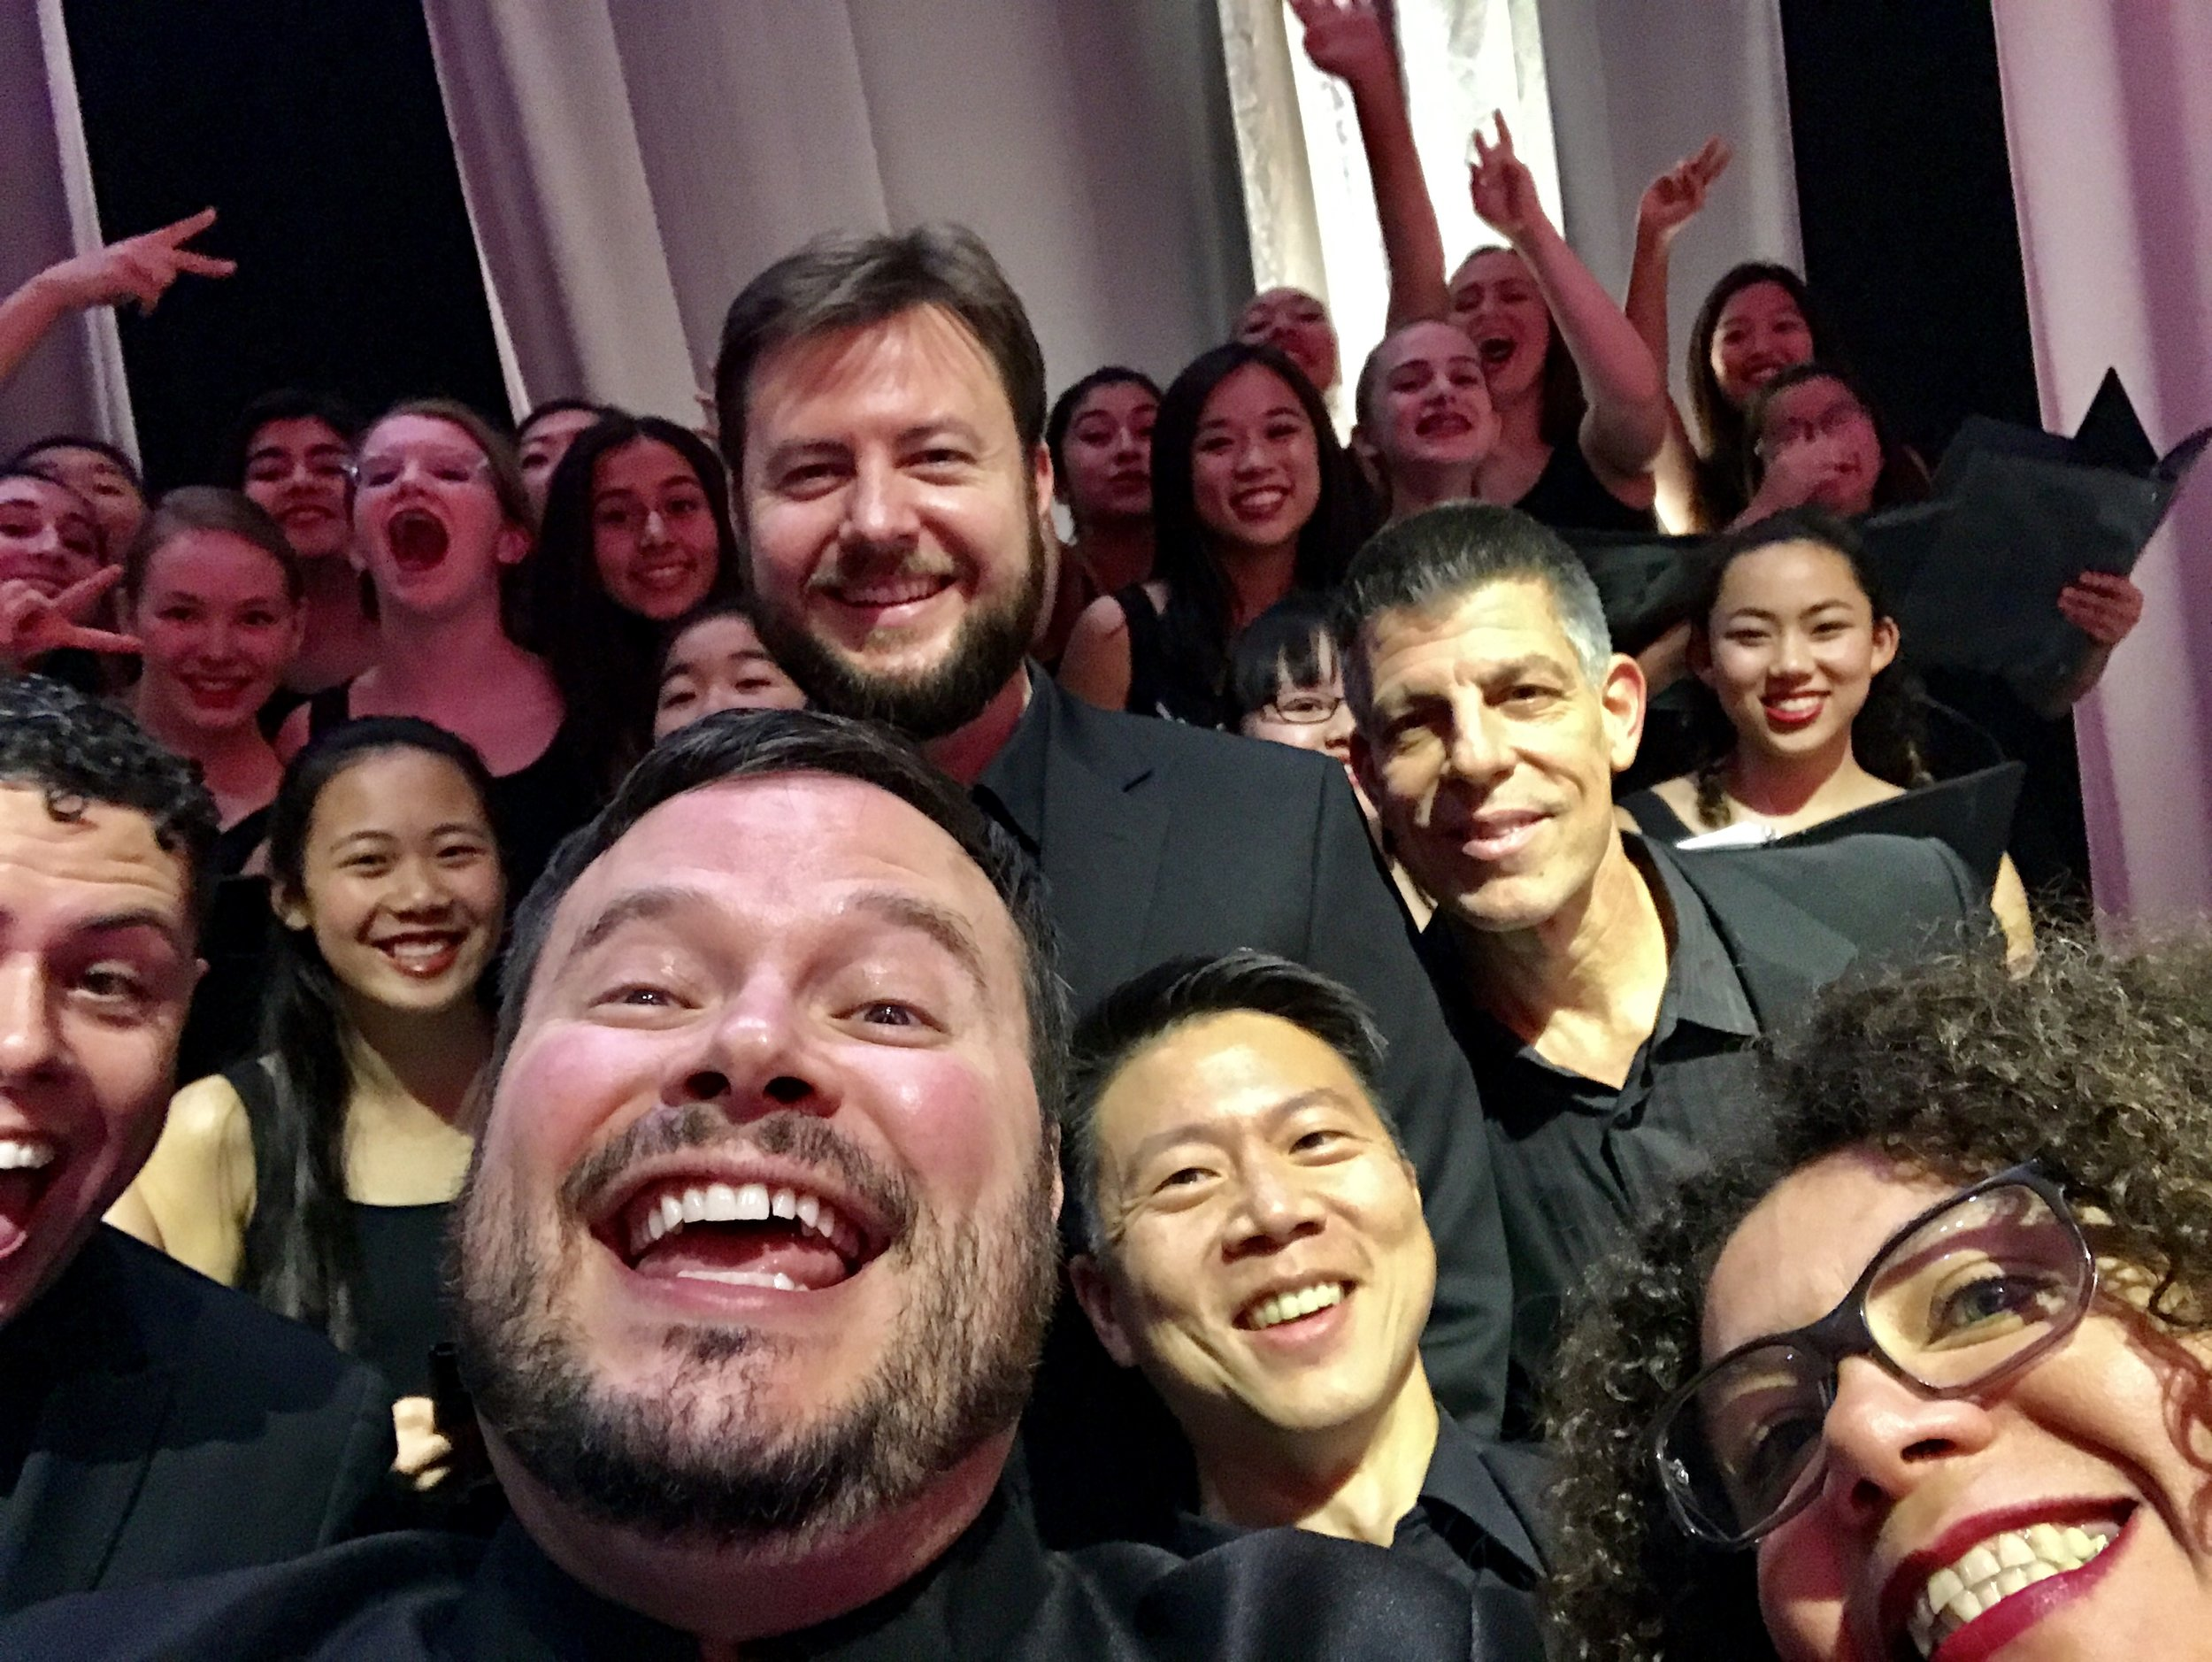 Clerestory, The San Francisco Girls Chorus, Valerie Sainte-Agathe, and Me